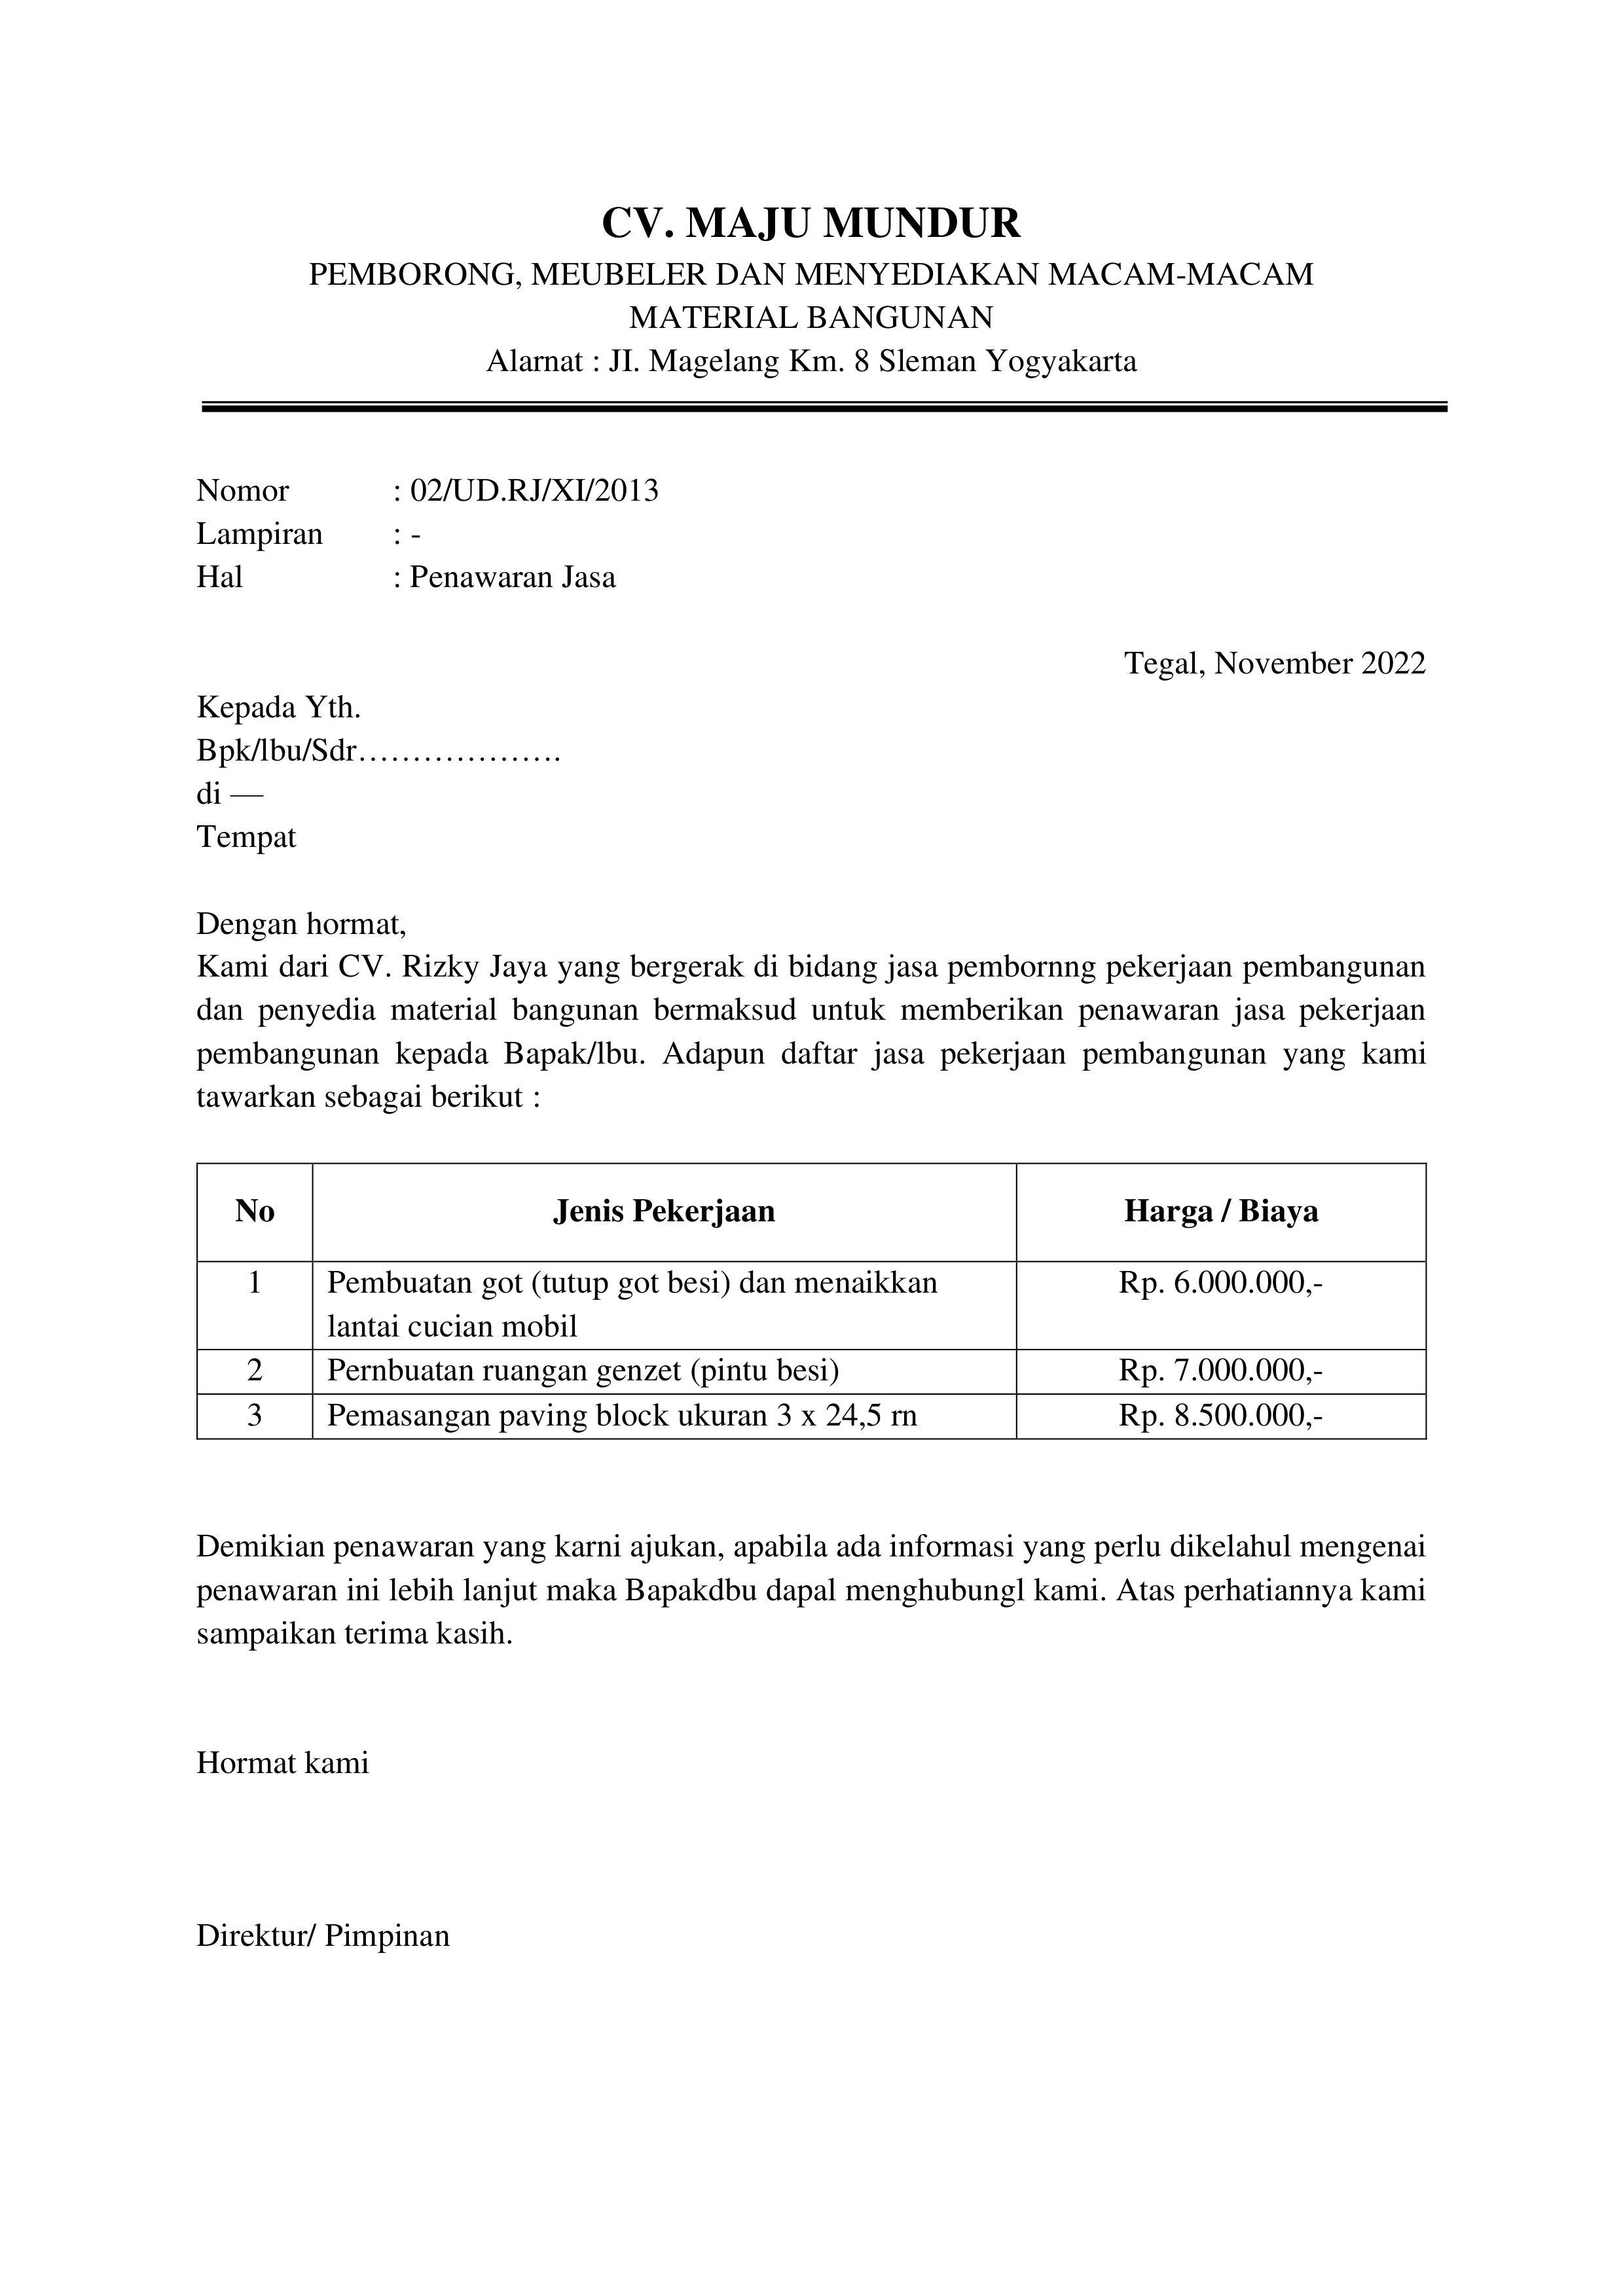 Contoh Surat Penawaran Harga Pekerjaan